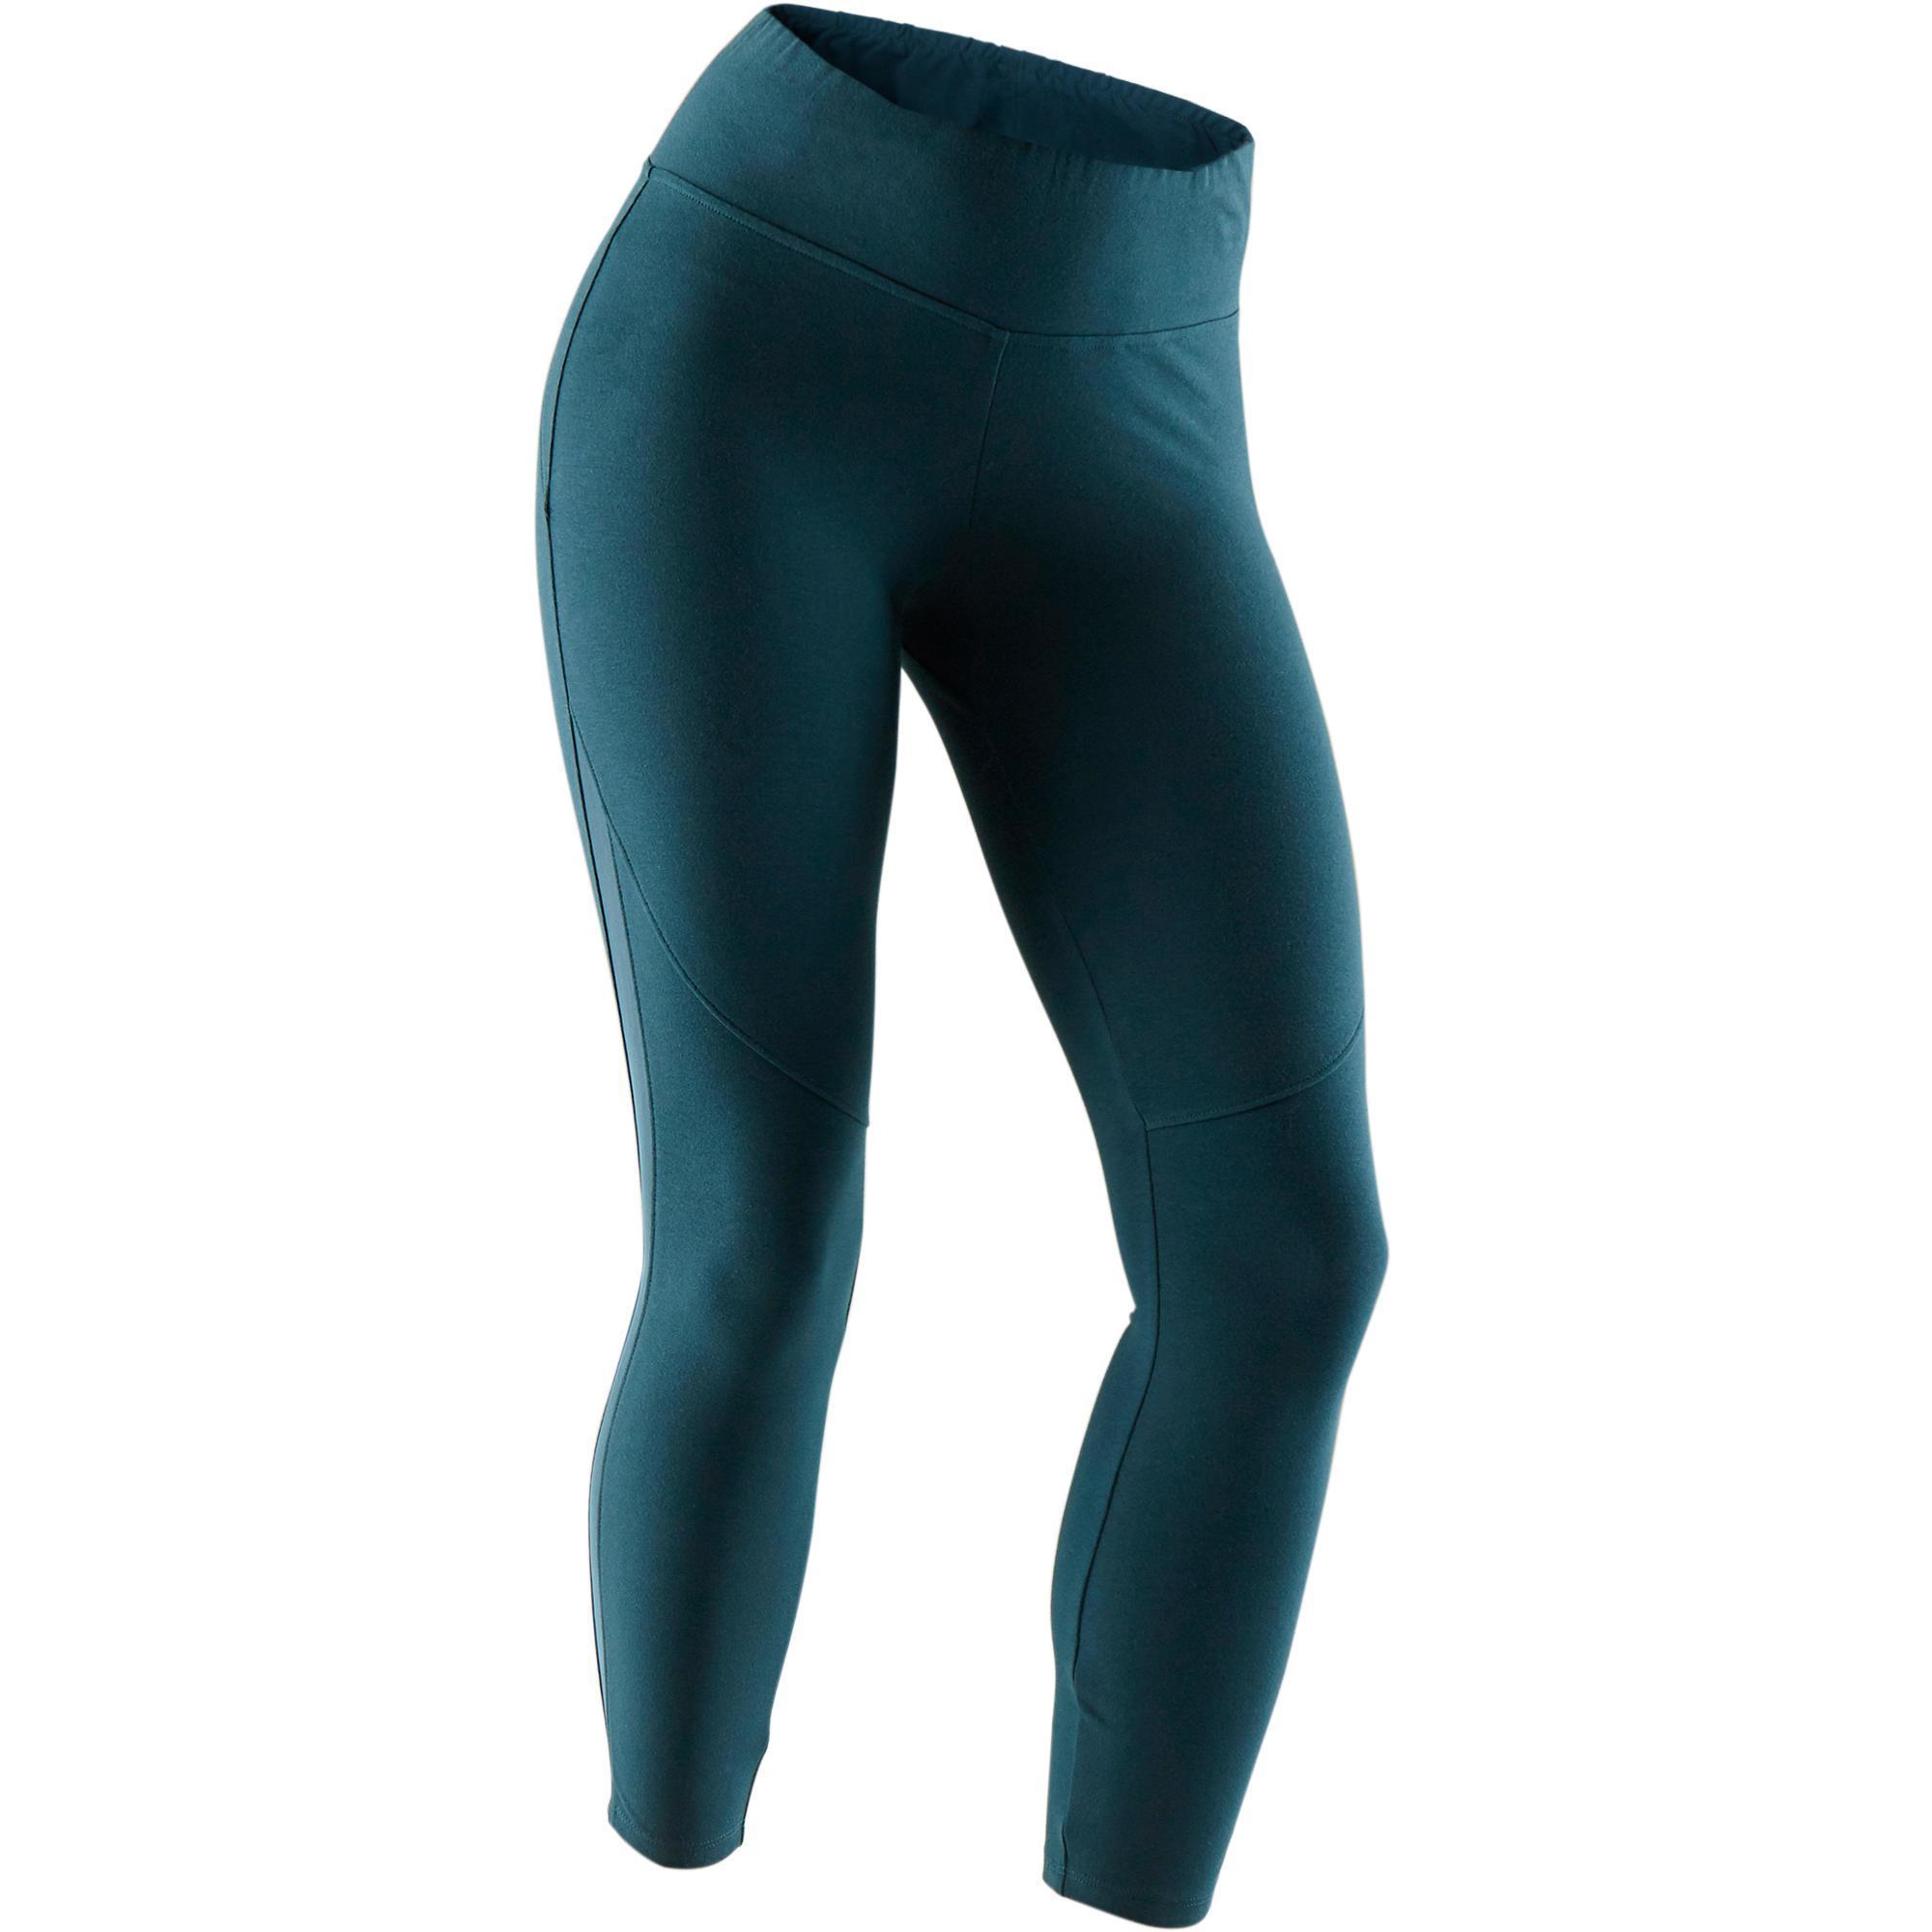 Domyos 7/8-legging 520 pilates en lichte gym dames turquoise